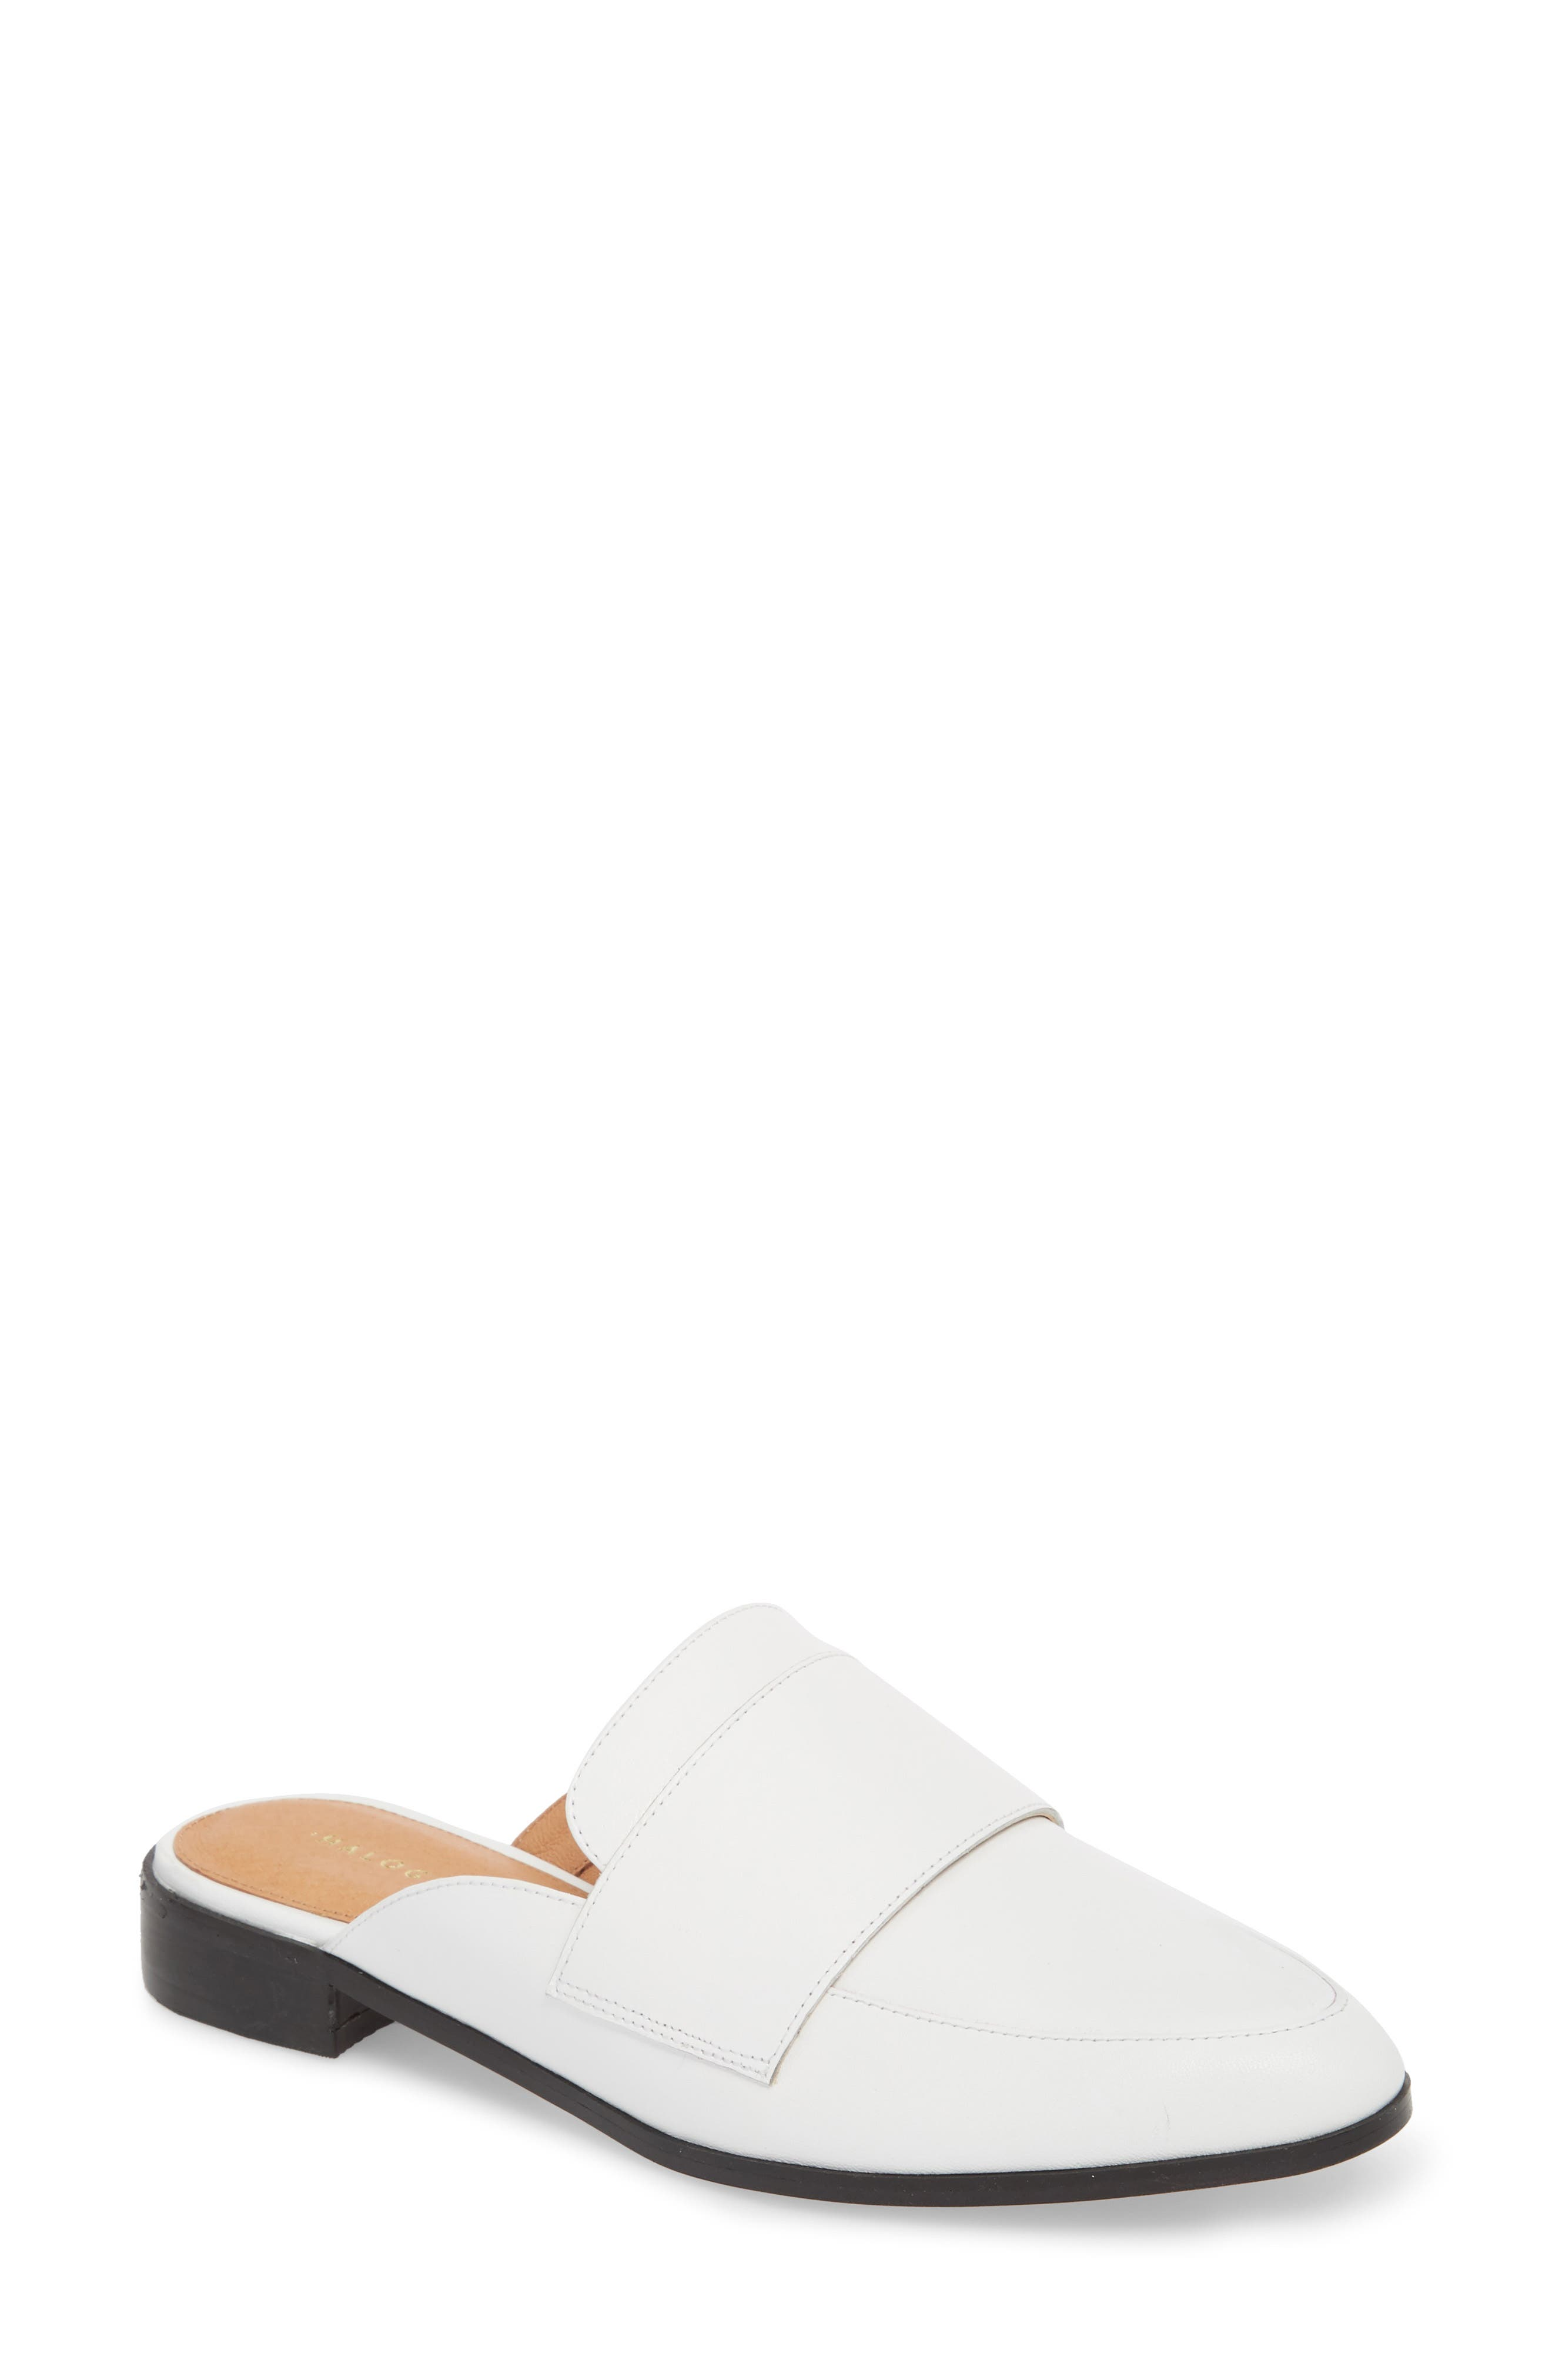 Violet Mule,                             Main thumbnail 1, color,                             White Leather